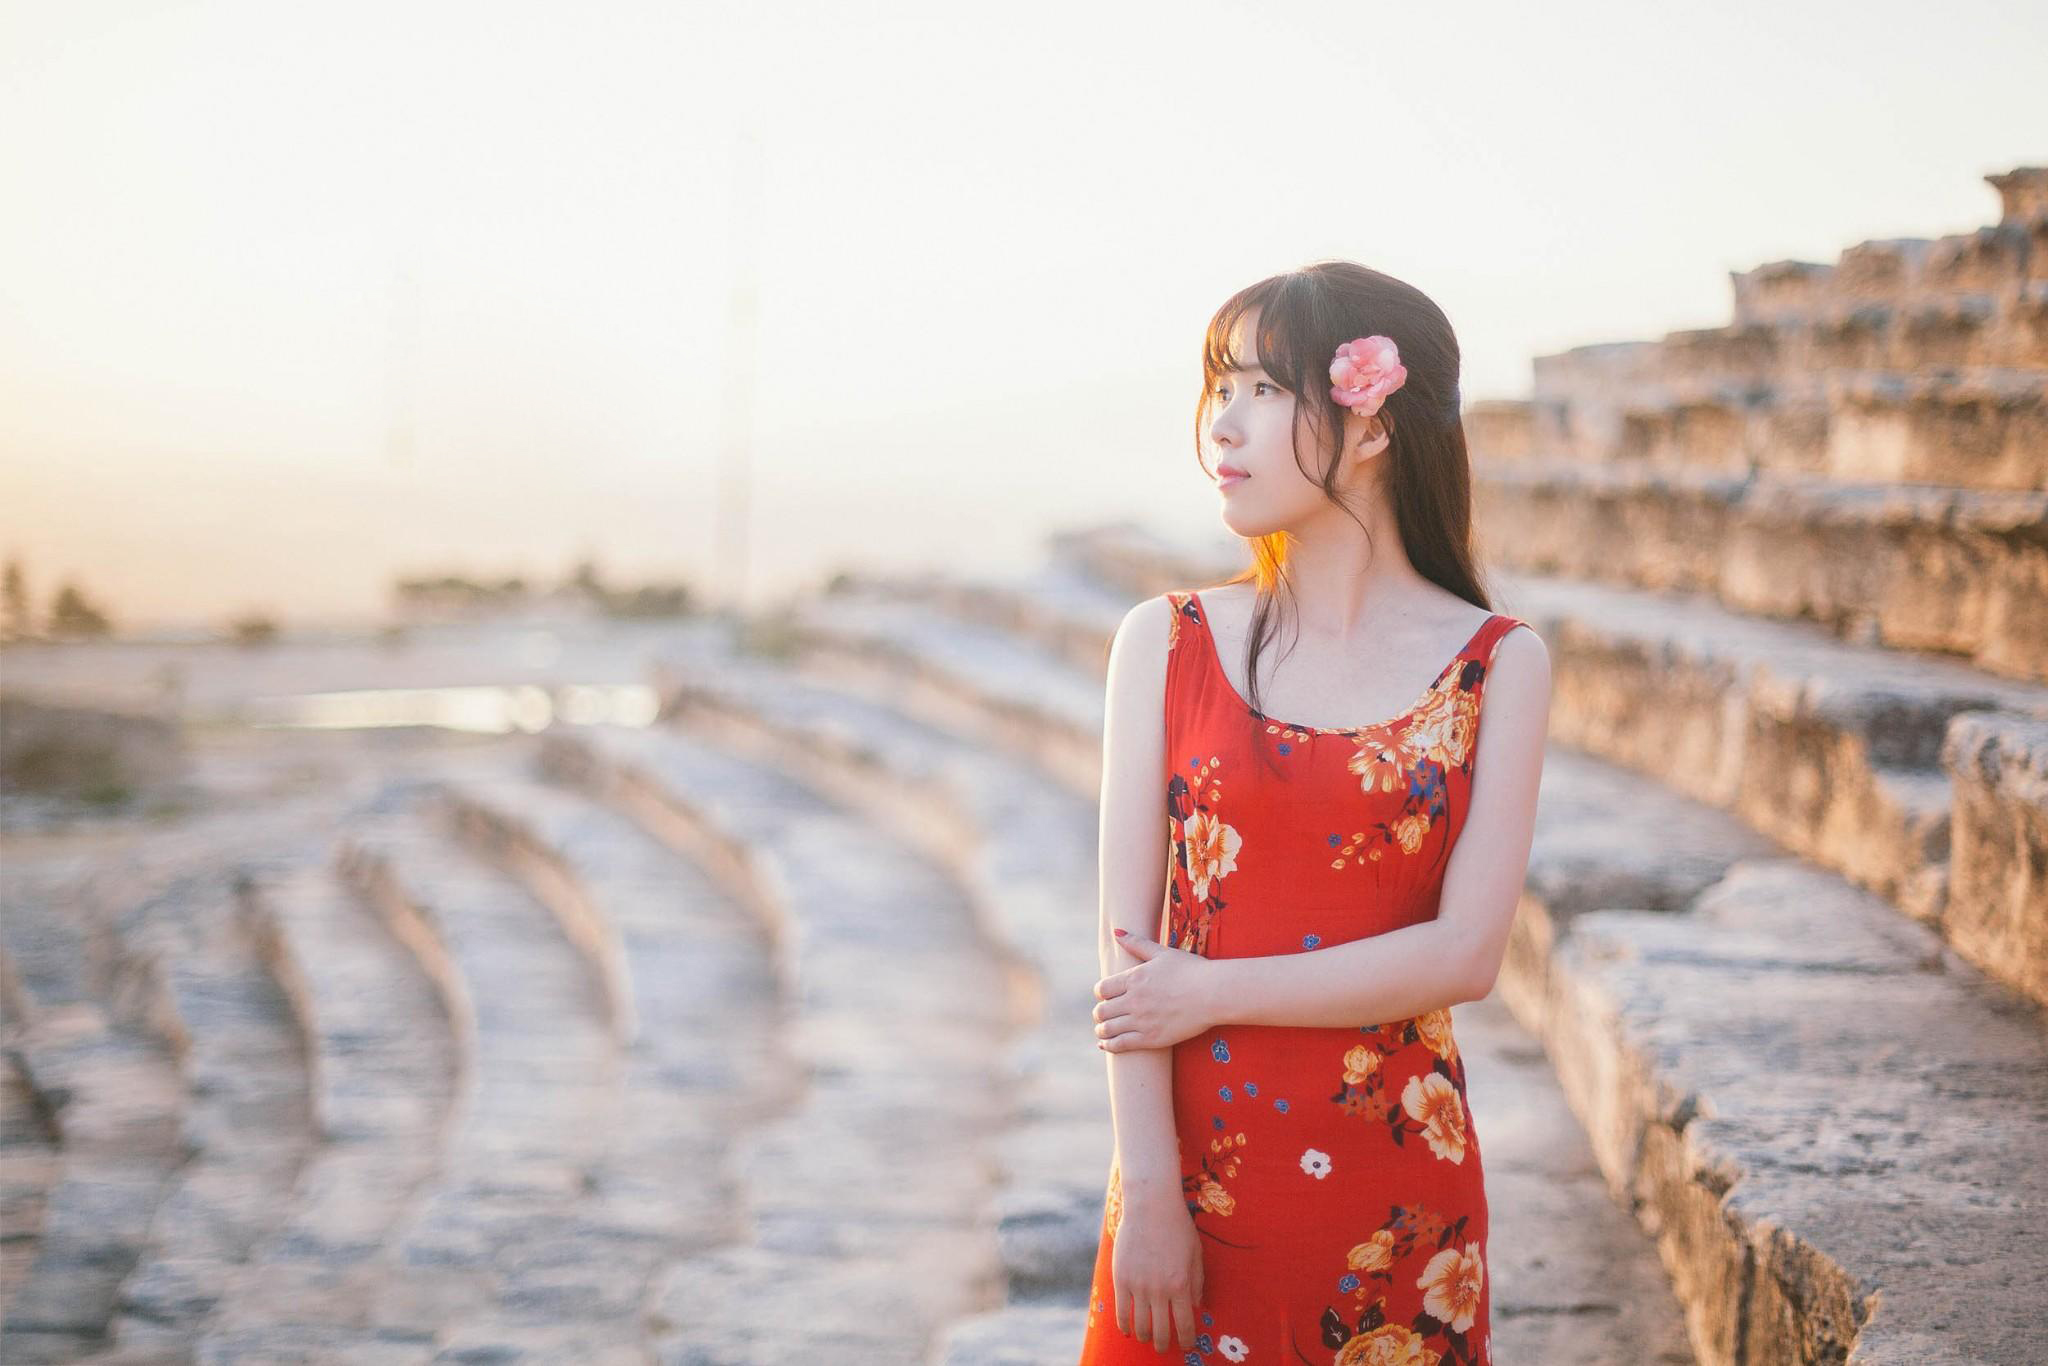 【VIP】贵州贵阳黄果树、大小七孔、西江、青岩古镇、花溪湿地公园6日5晚